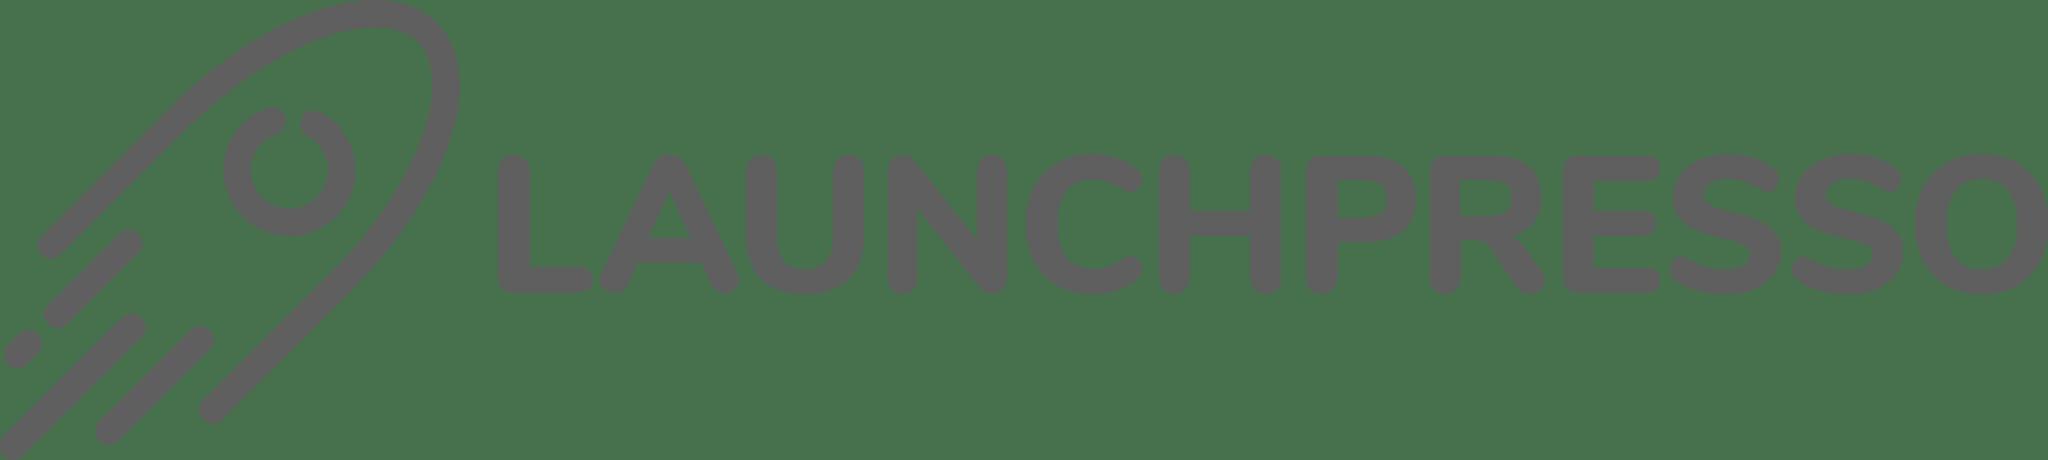 Launchpresso Digital Marketing